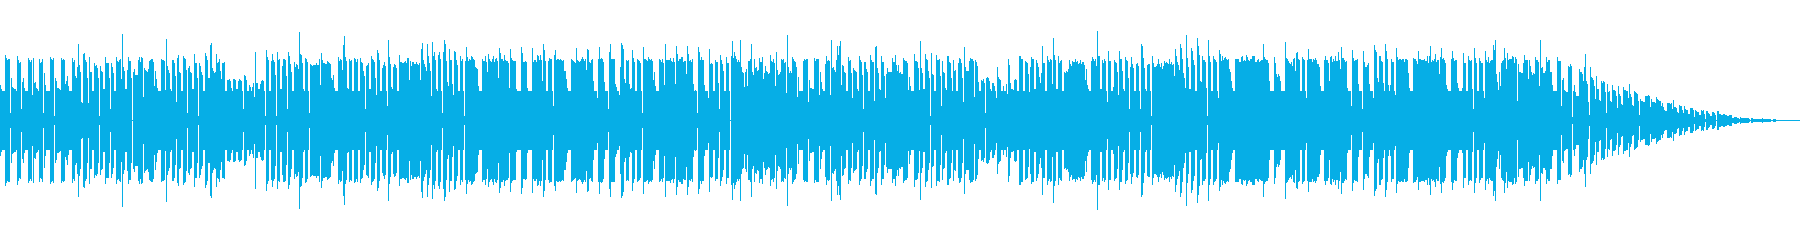 【8bit】明るくチップなフィールドの再生済みの波形